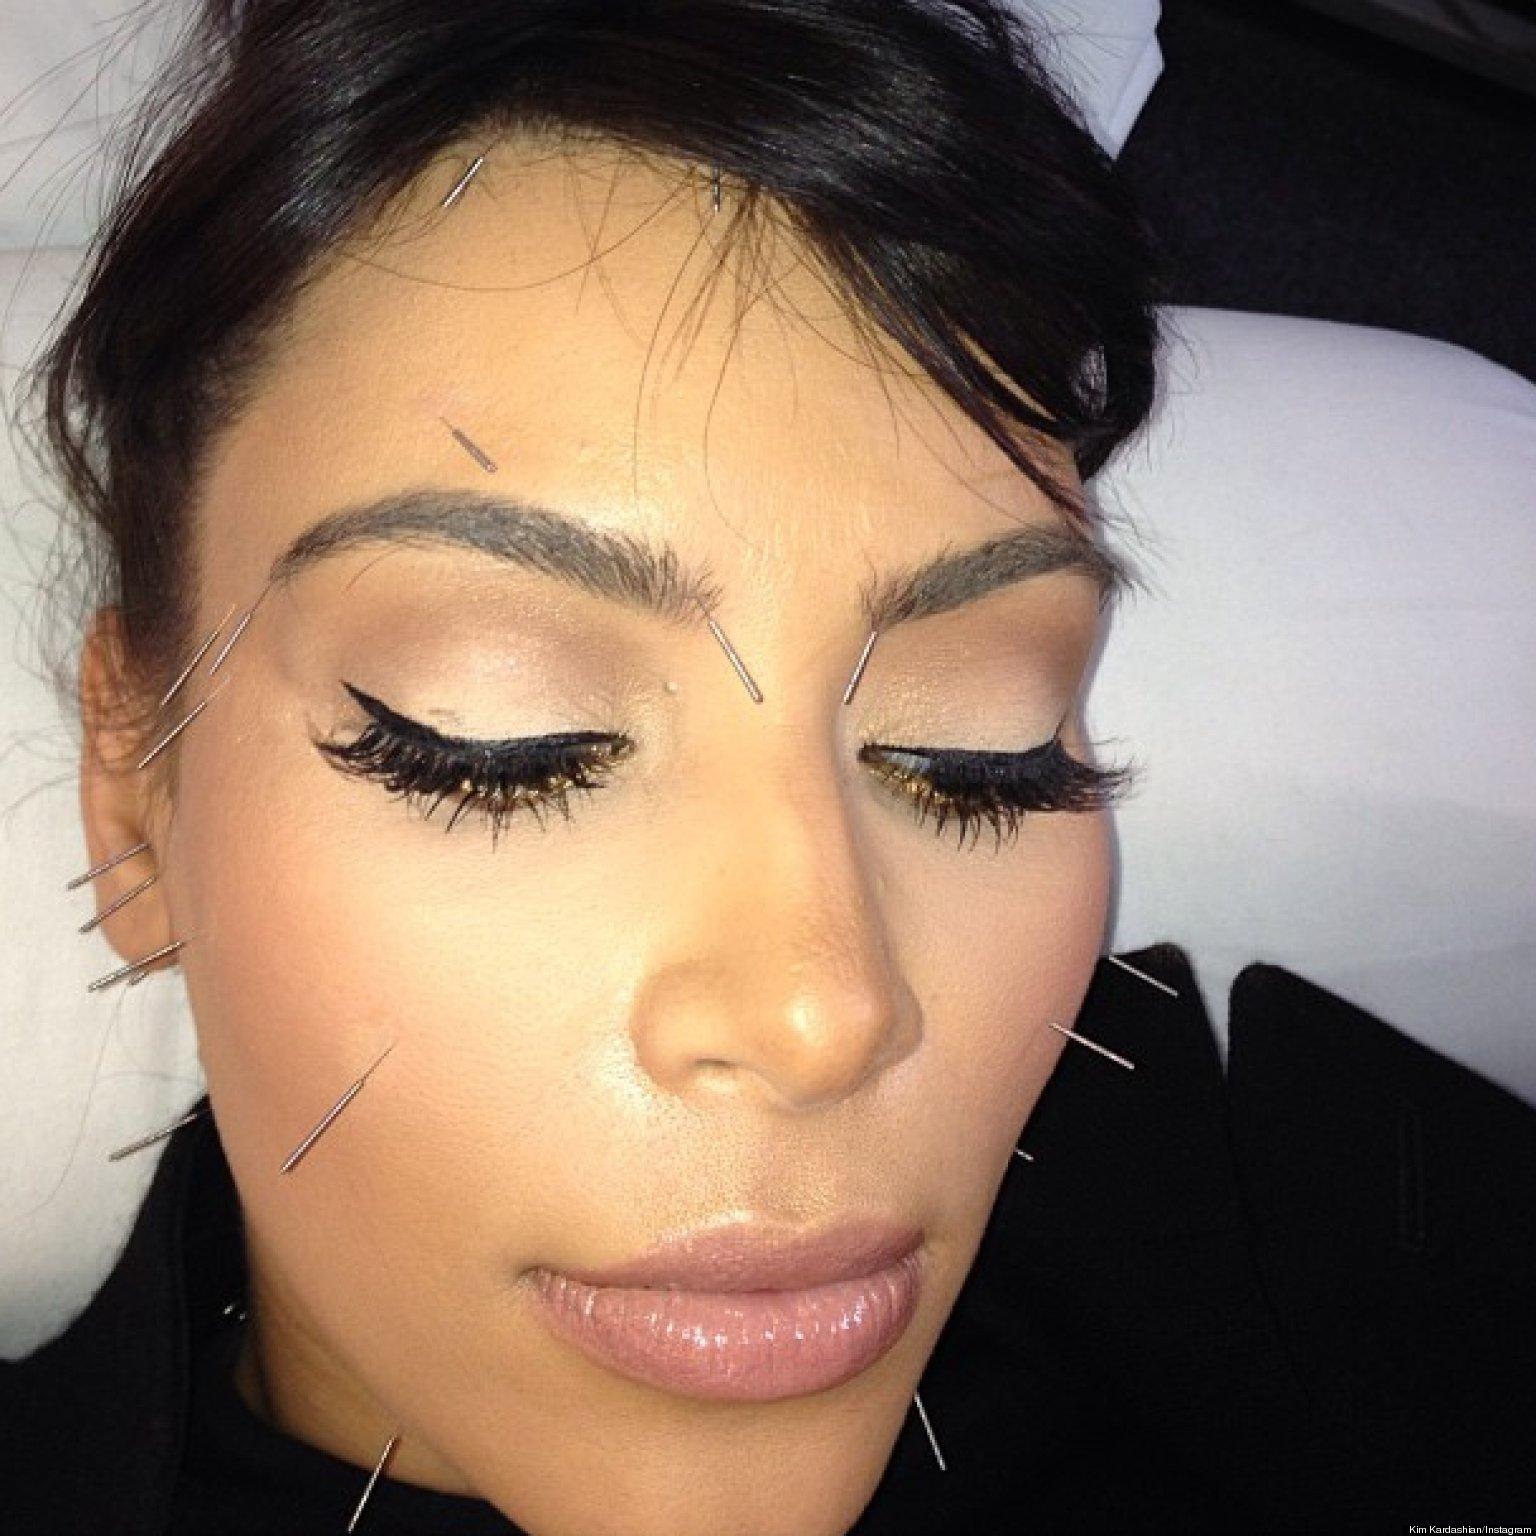 Kim Kardashian Instagrams Acupuncture Face (PHOTO)